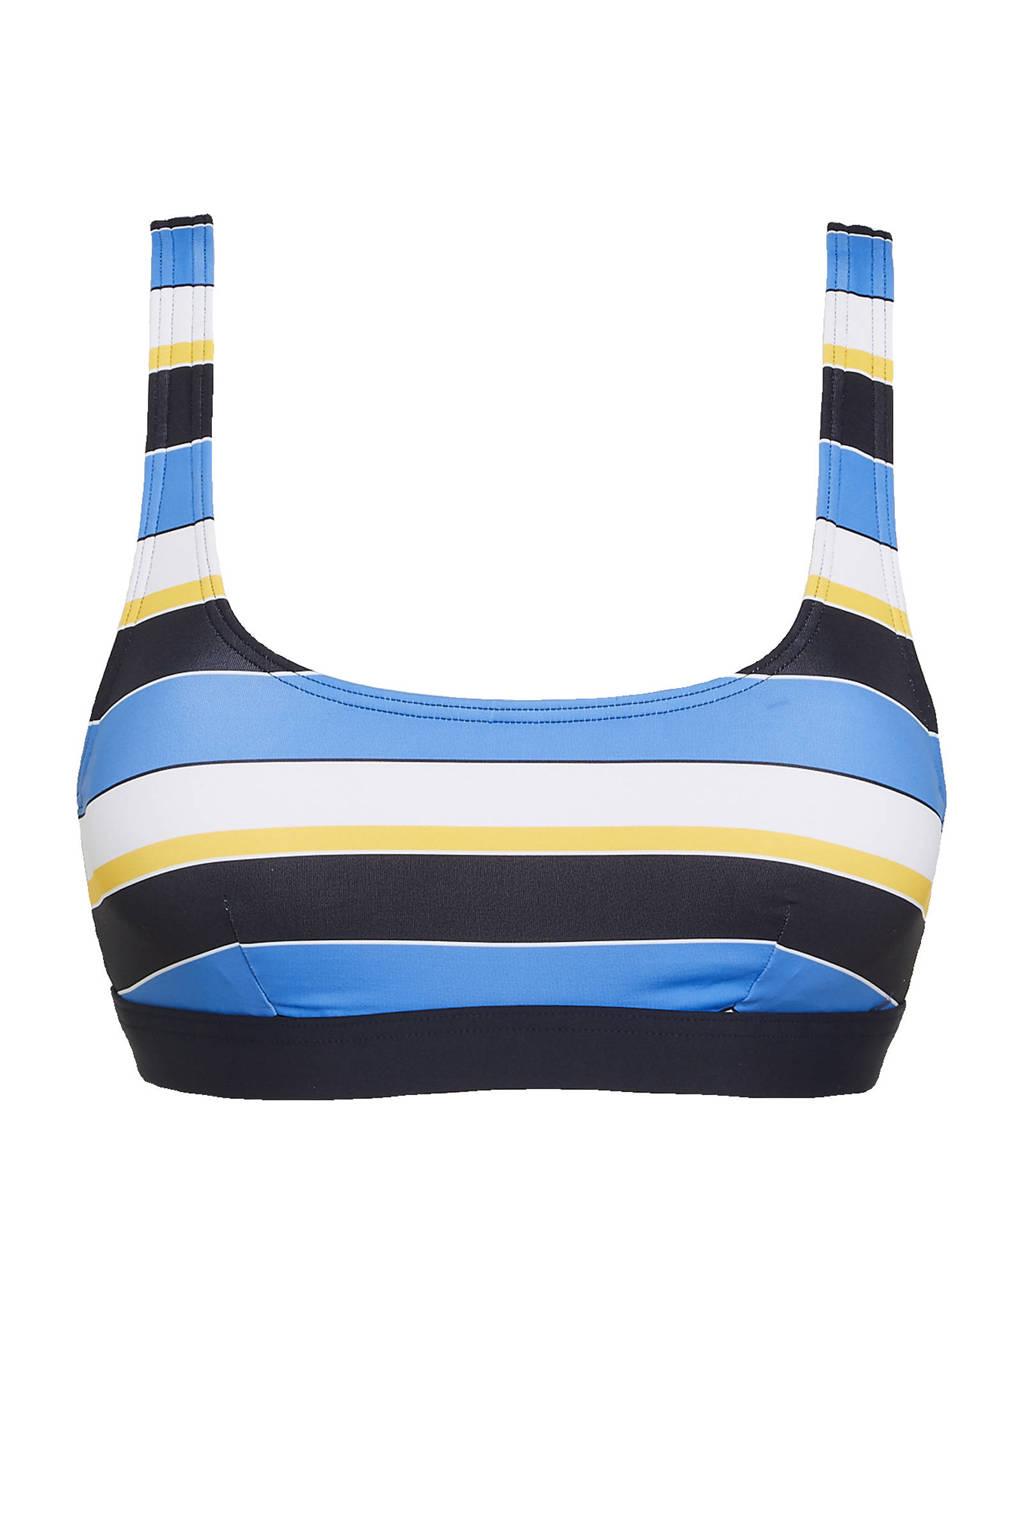 ESPRIT Women Beach gestreepte crop bikinitop Brendon donkerblauw/blauw/wit, Donkerblauw/blauw/wit